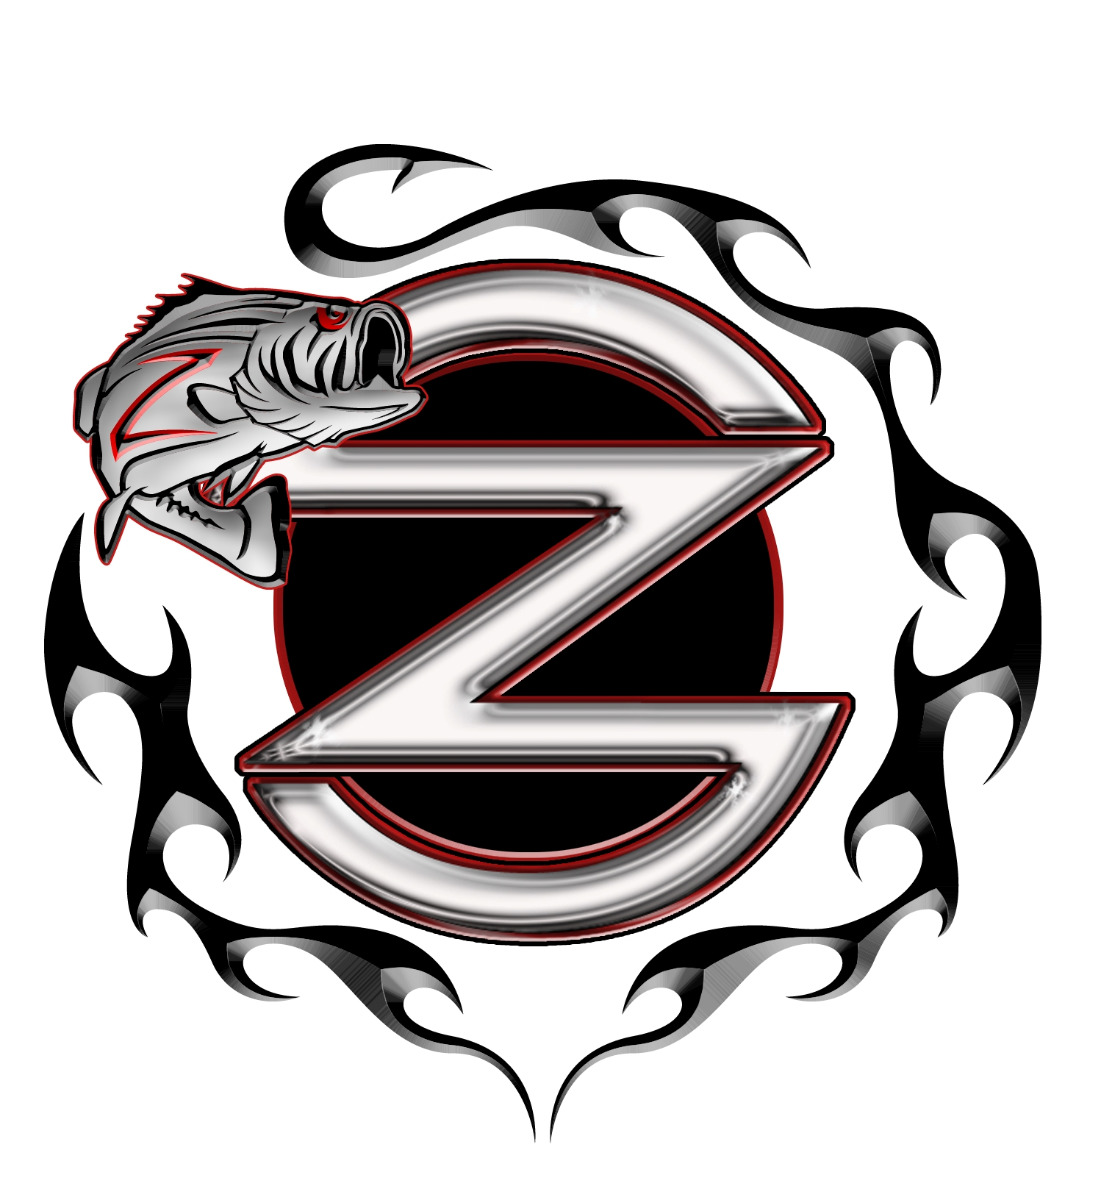 Mark Zona - Zona's Awesome Fishing Show